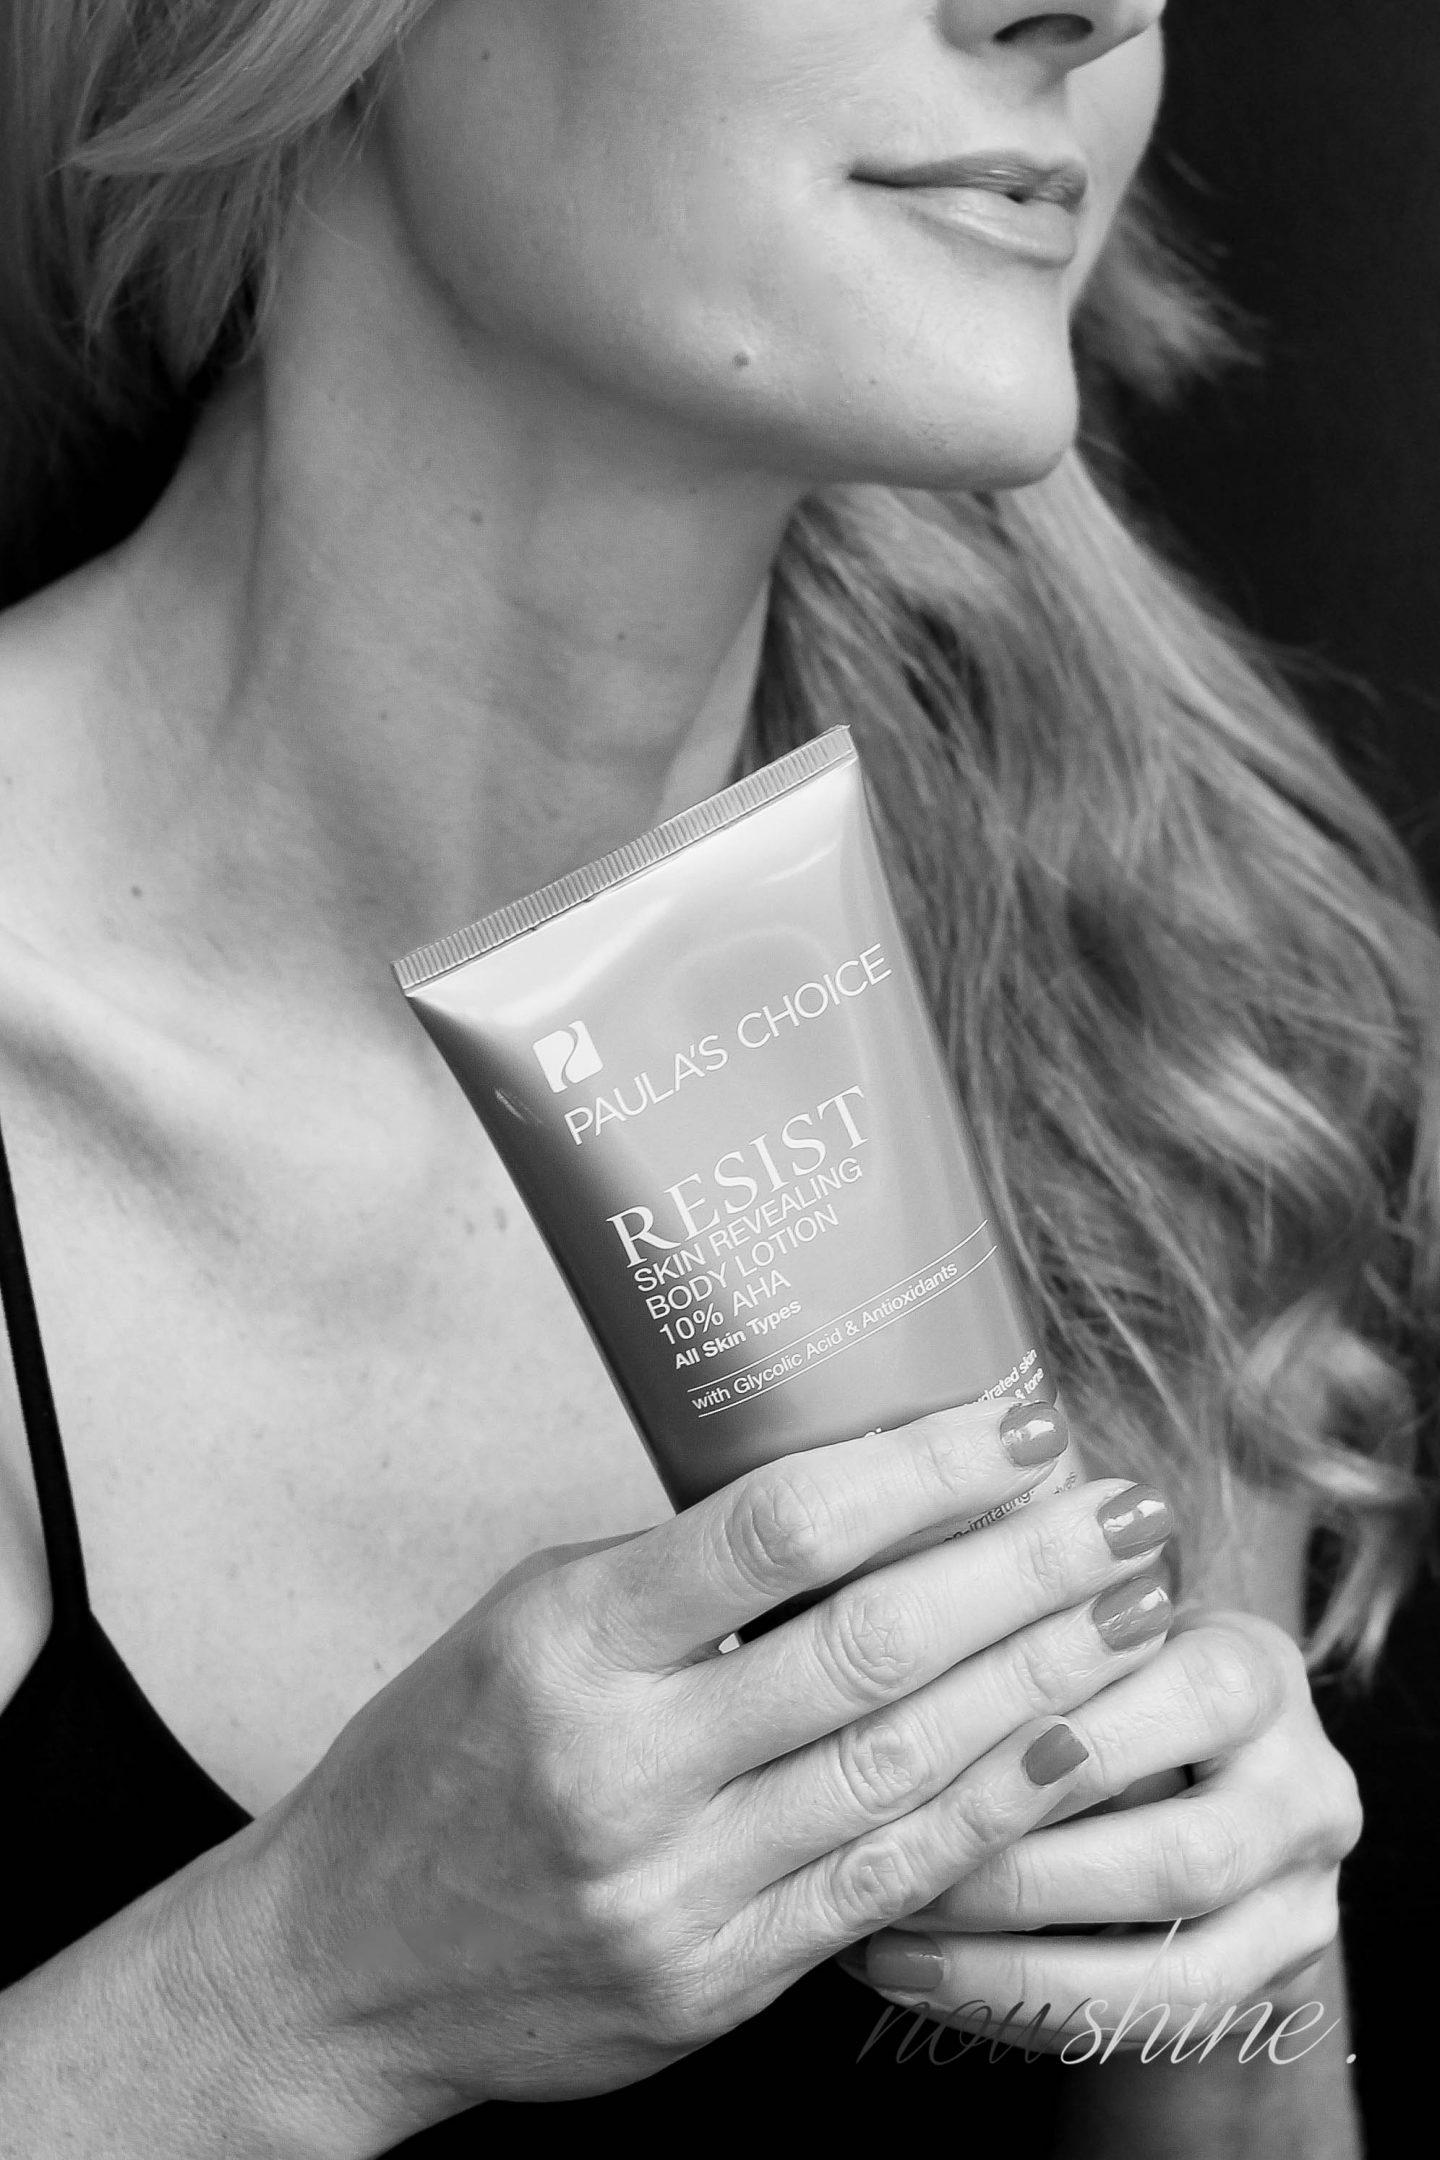 Truth in Beauty-Exfoliant-Peelings-Paulas Choice-Resist-Nowshine Beauty Blog ue 40